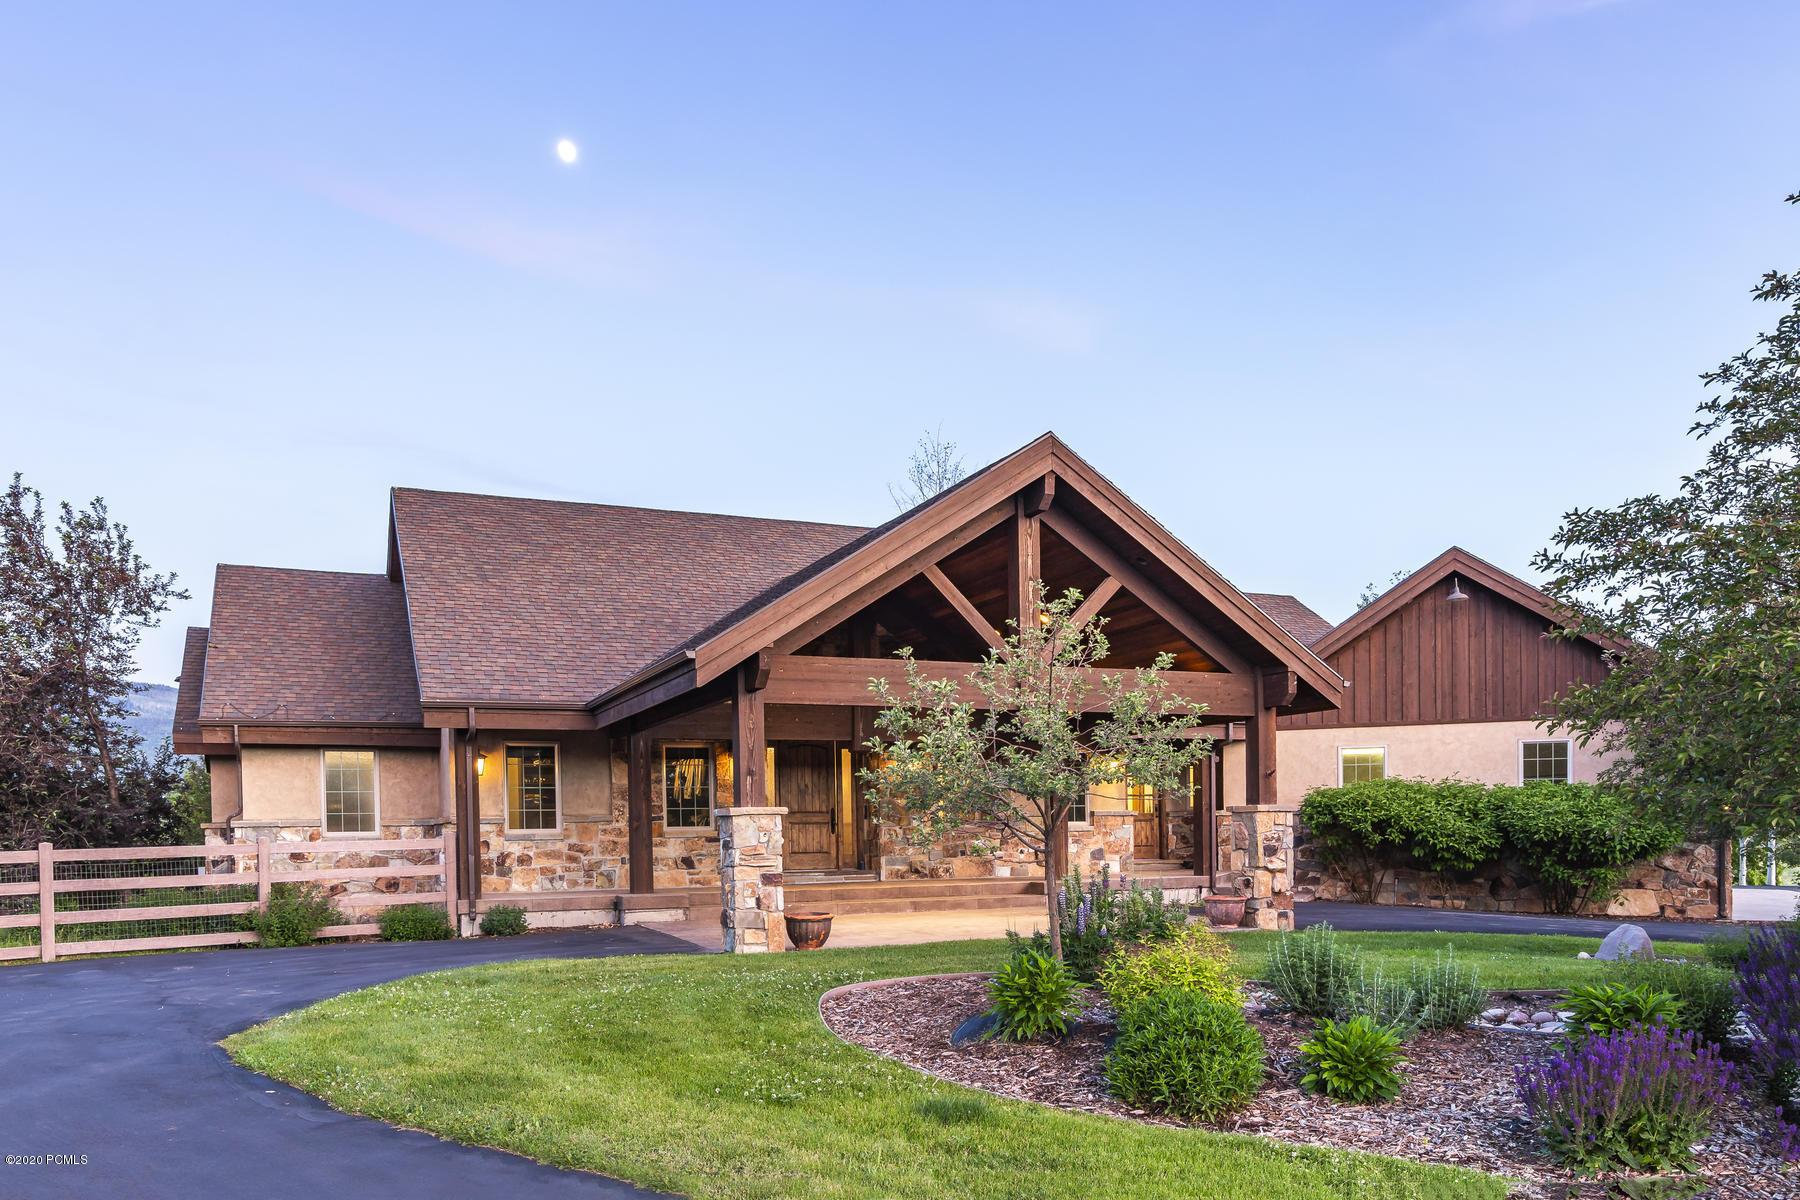 4285 Riverview Court, Oakley, Utah 84055, 7 Bedrooms Bedrooms, ,6 BathroomsBathrooms,Single Family,For Sale,Riverview,20190109112430415765000000